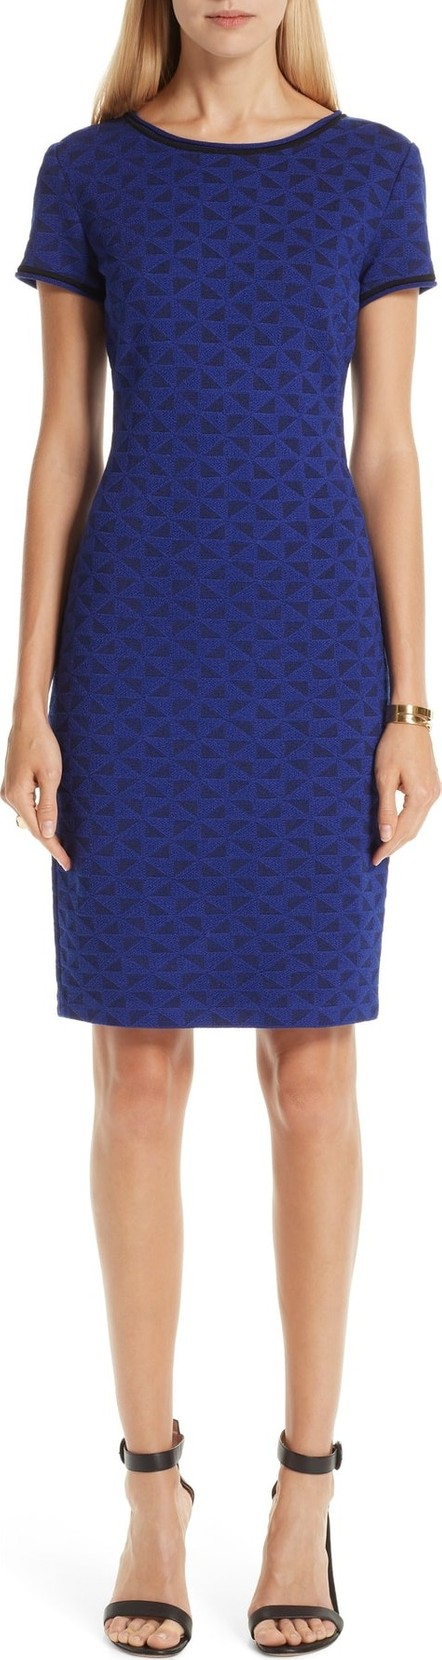 St. John Micro Geo Blister Knit Sheath Dress